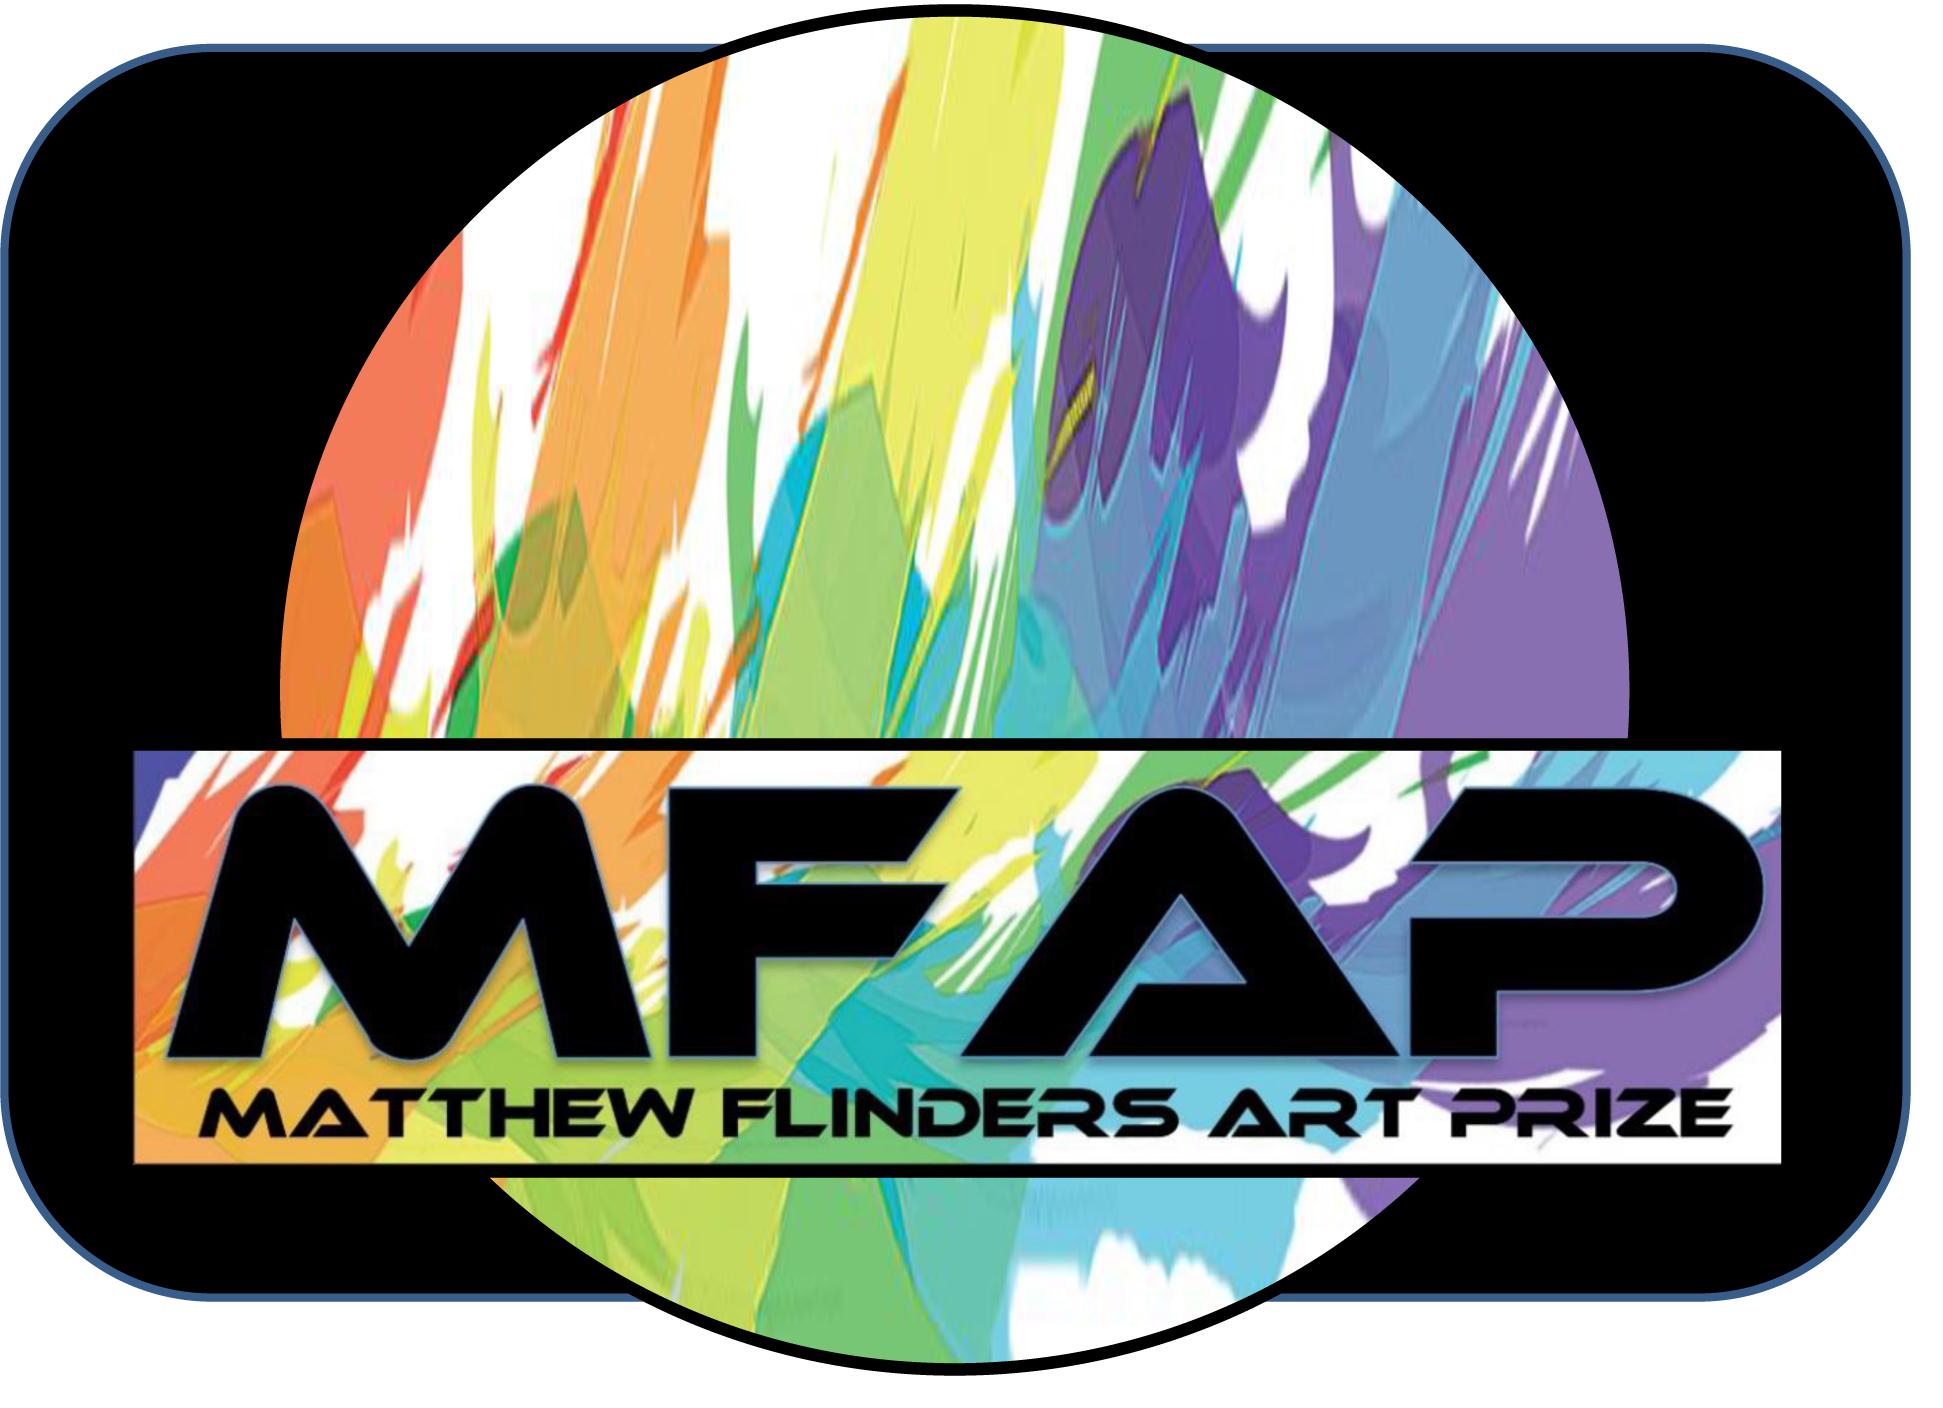 Matthew Flinders Art Competition - Opening night Ticket